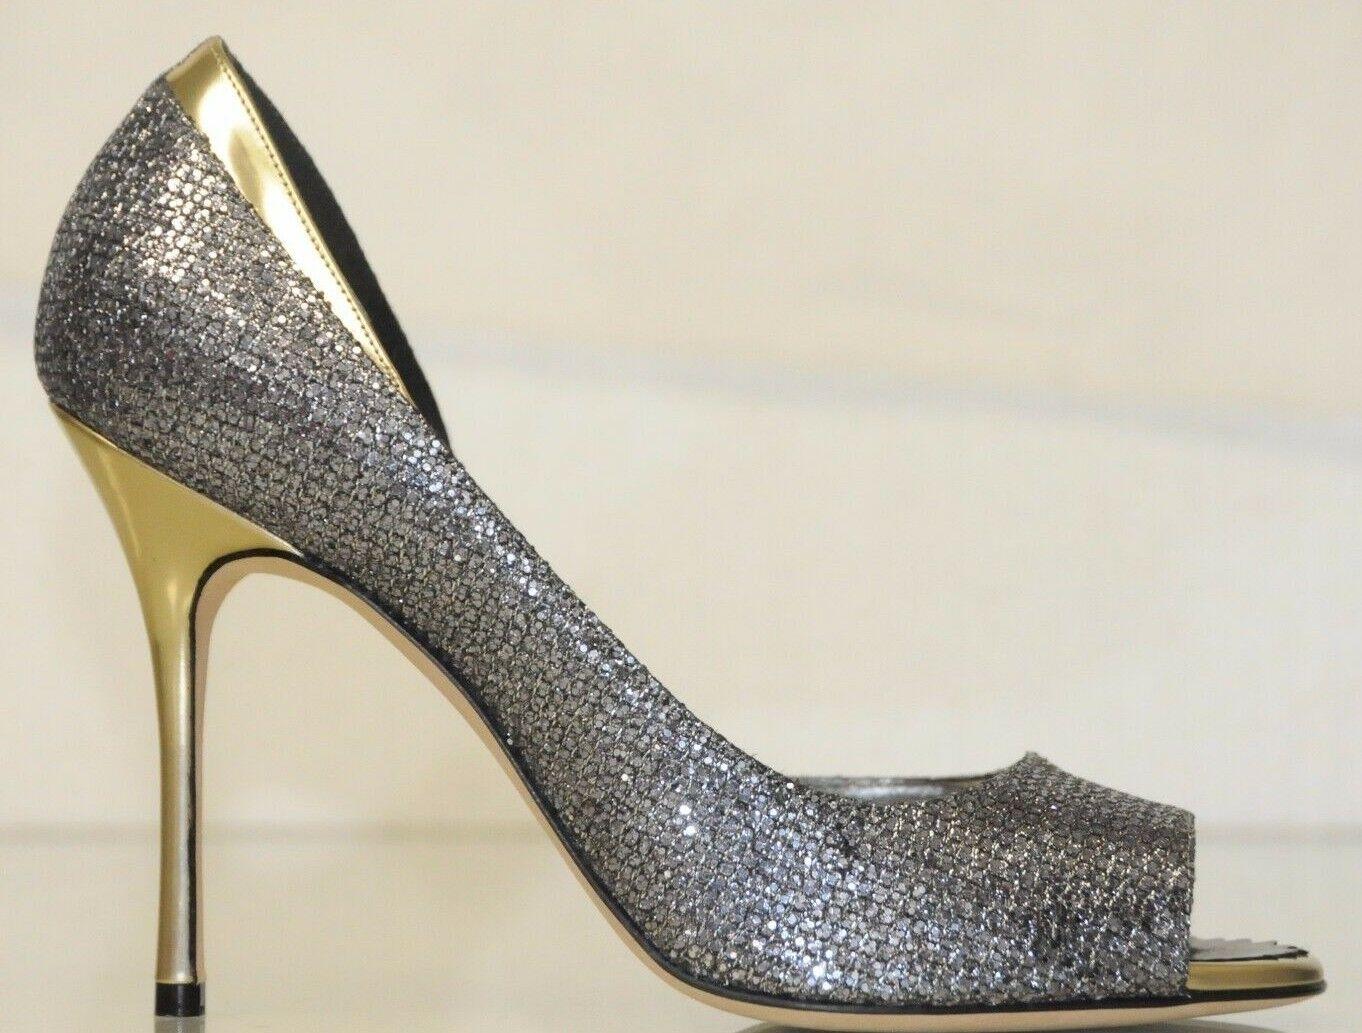 alto sconto Nuovo Manolo Blahnik Blahnik Blahnik Alim 105 Antracite argentoo con Glitter oro  gli ultimi modelli